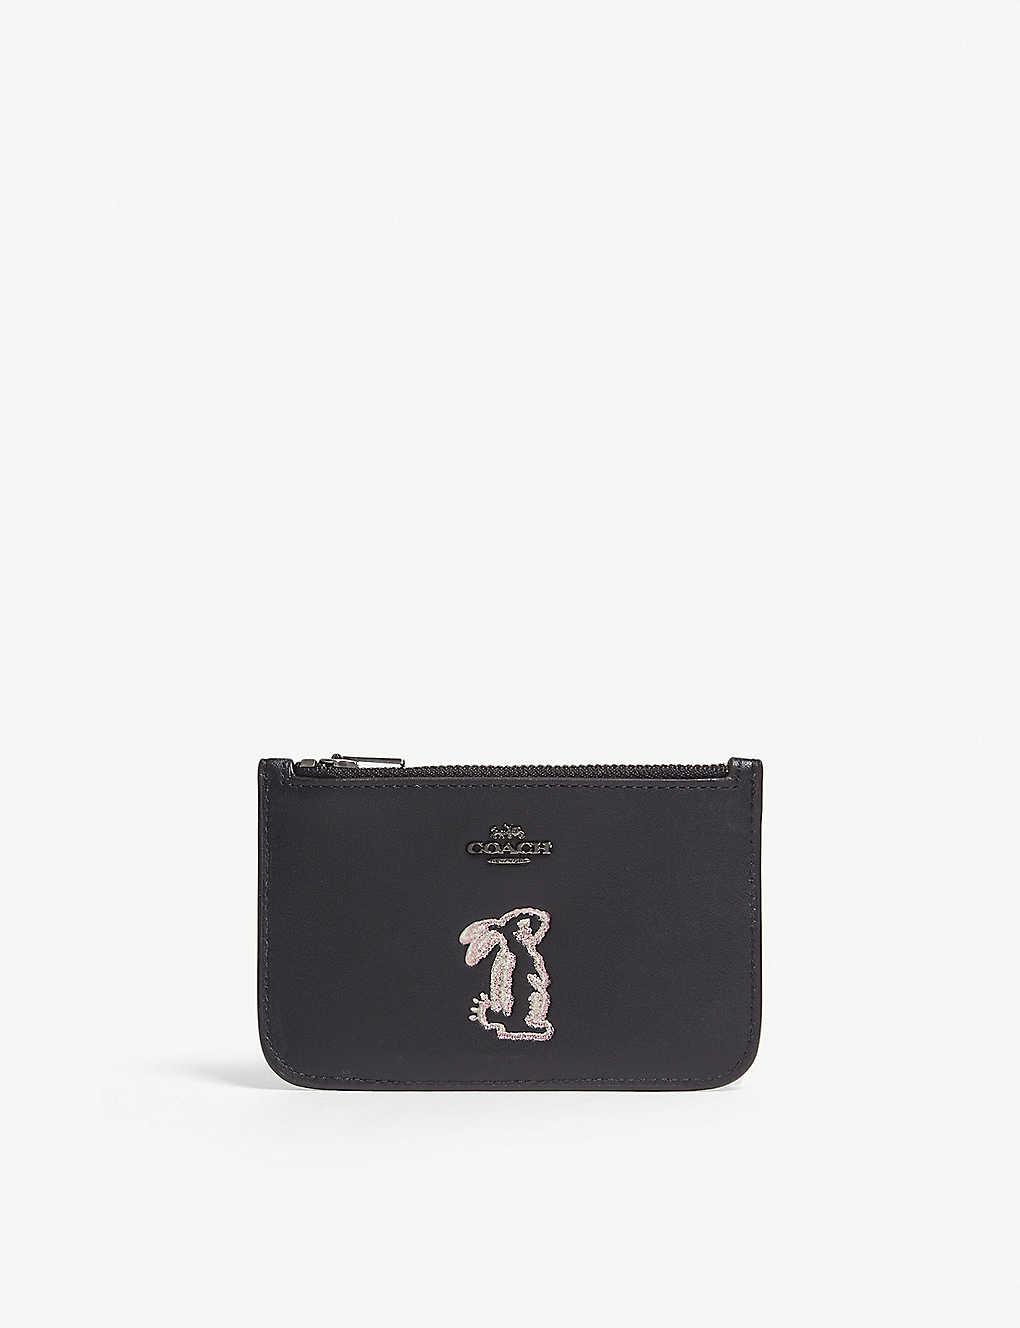 a1147c673f COACH - Coach x Selena zip card case with bunny | Selfridges.com